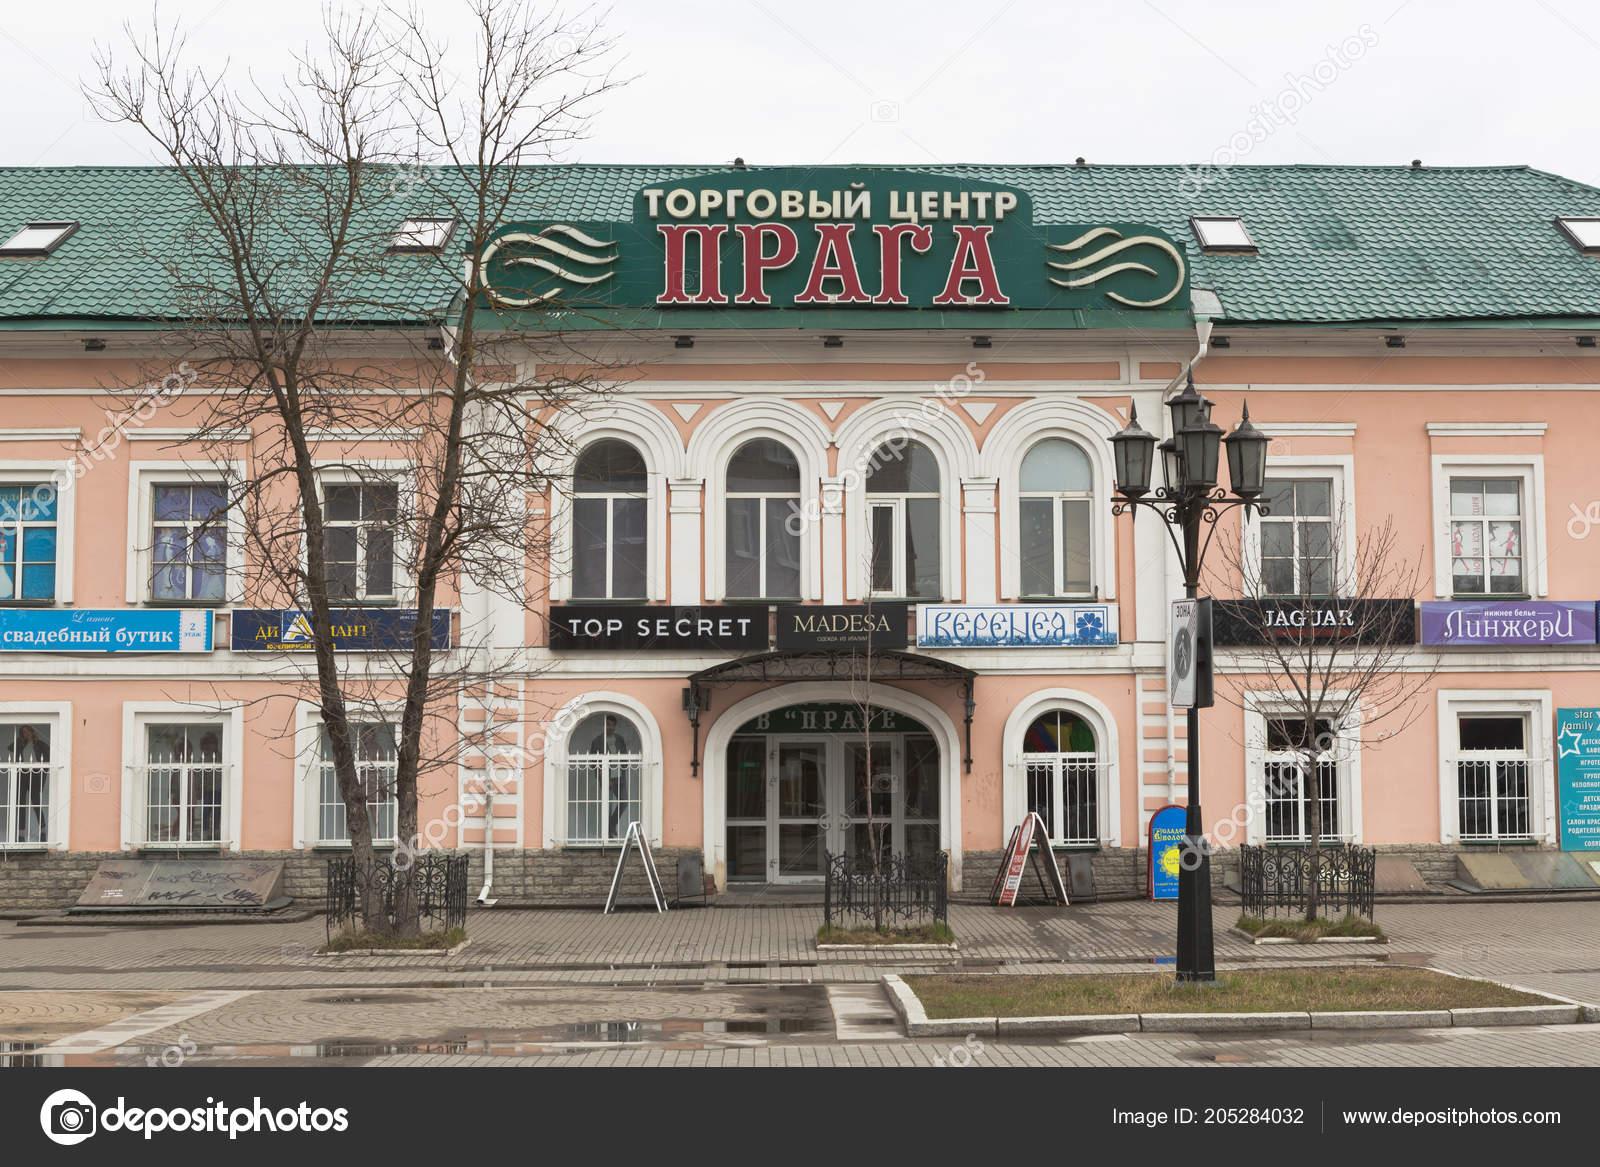 Shopping centers in Vologda. Description